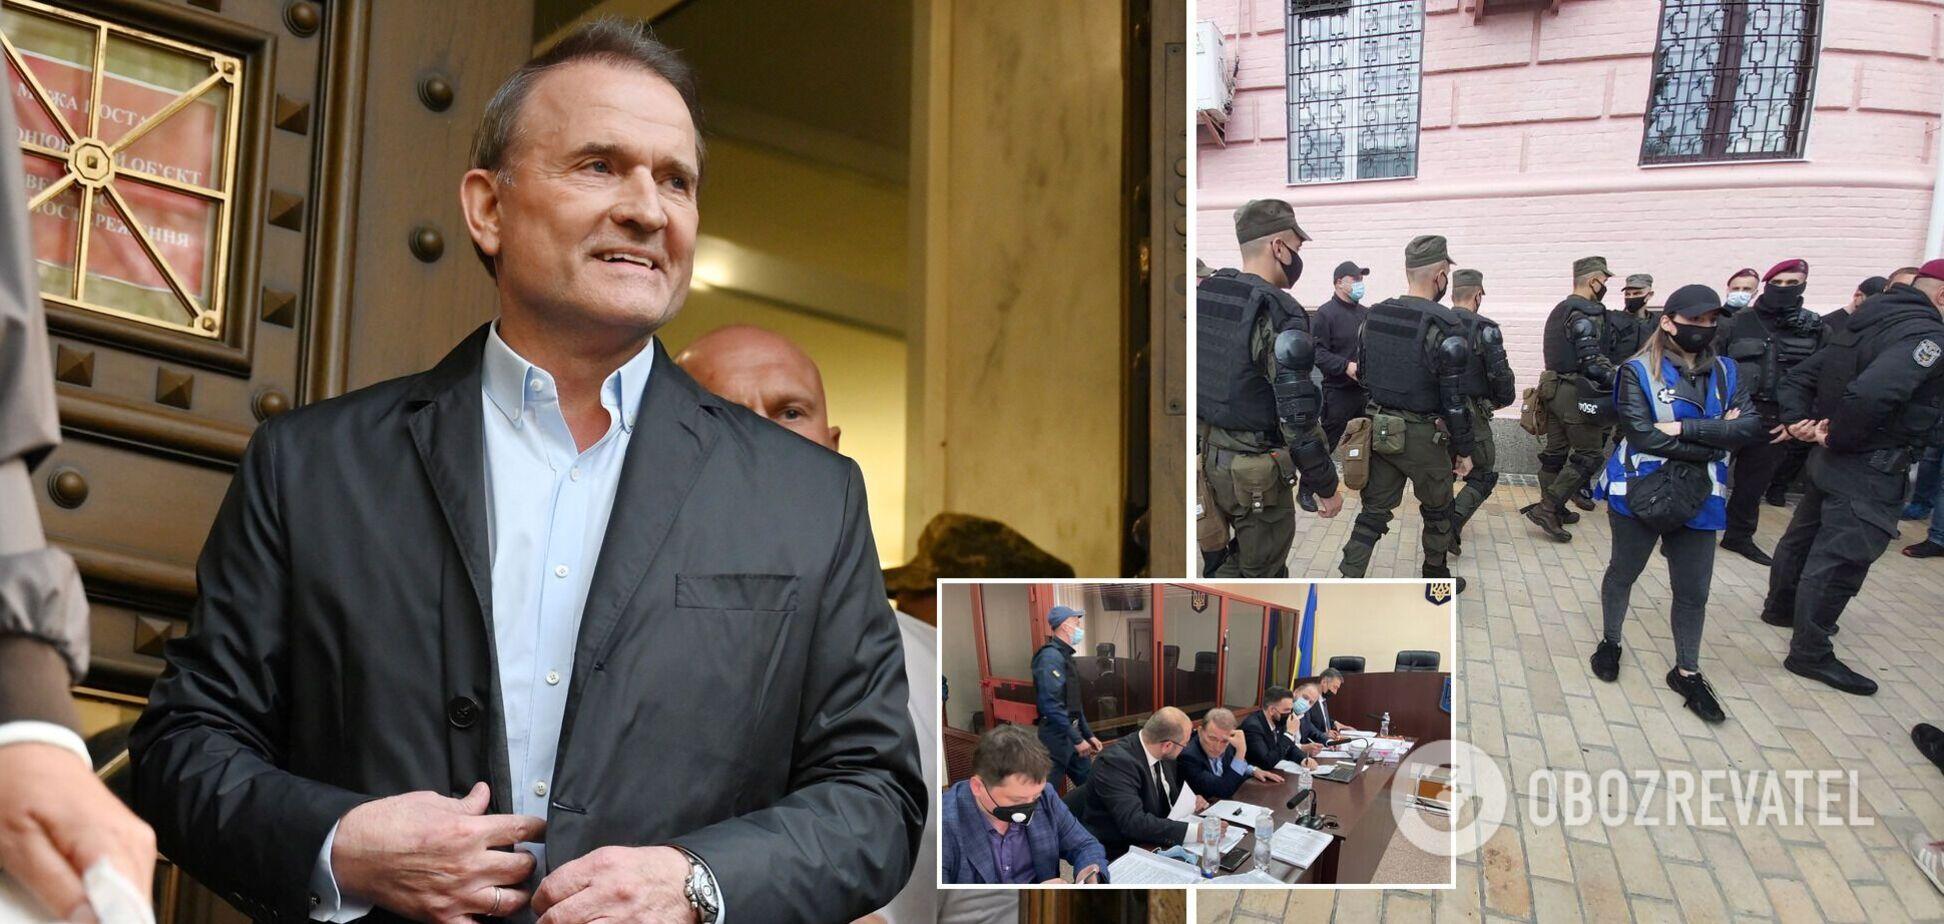 Медведчука не отправили в СИЗО: суд принял решение. Все детали, фото и видео